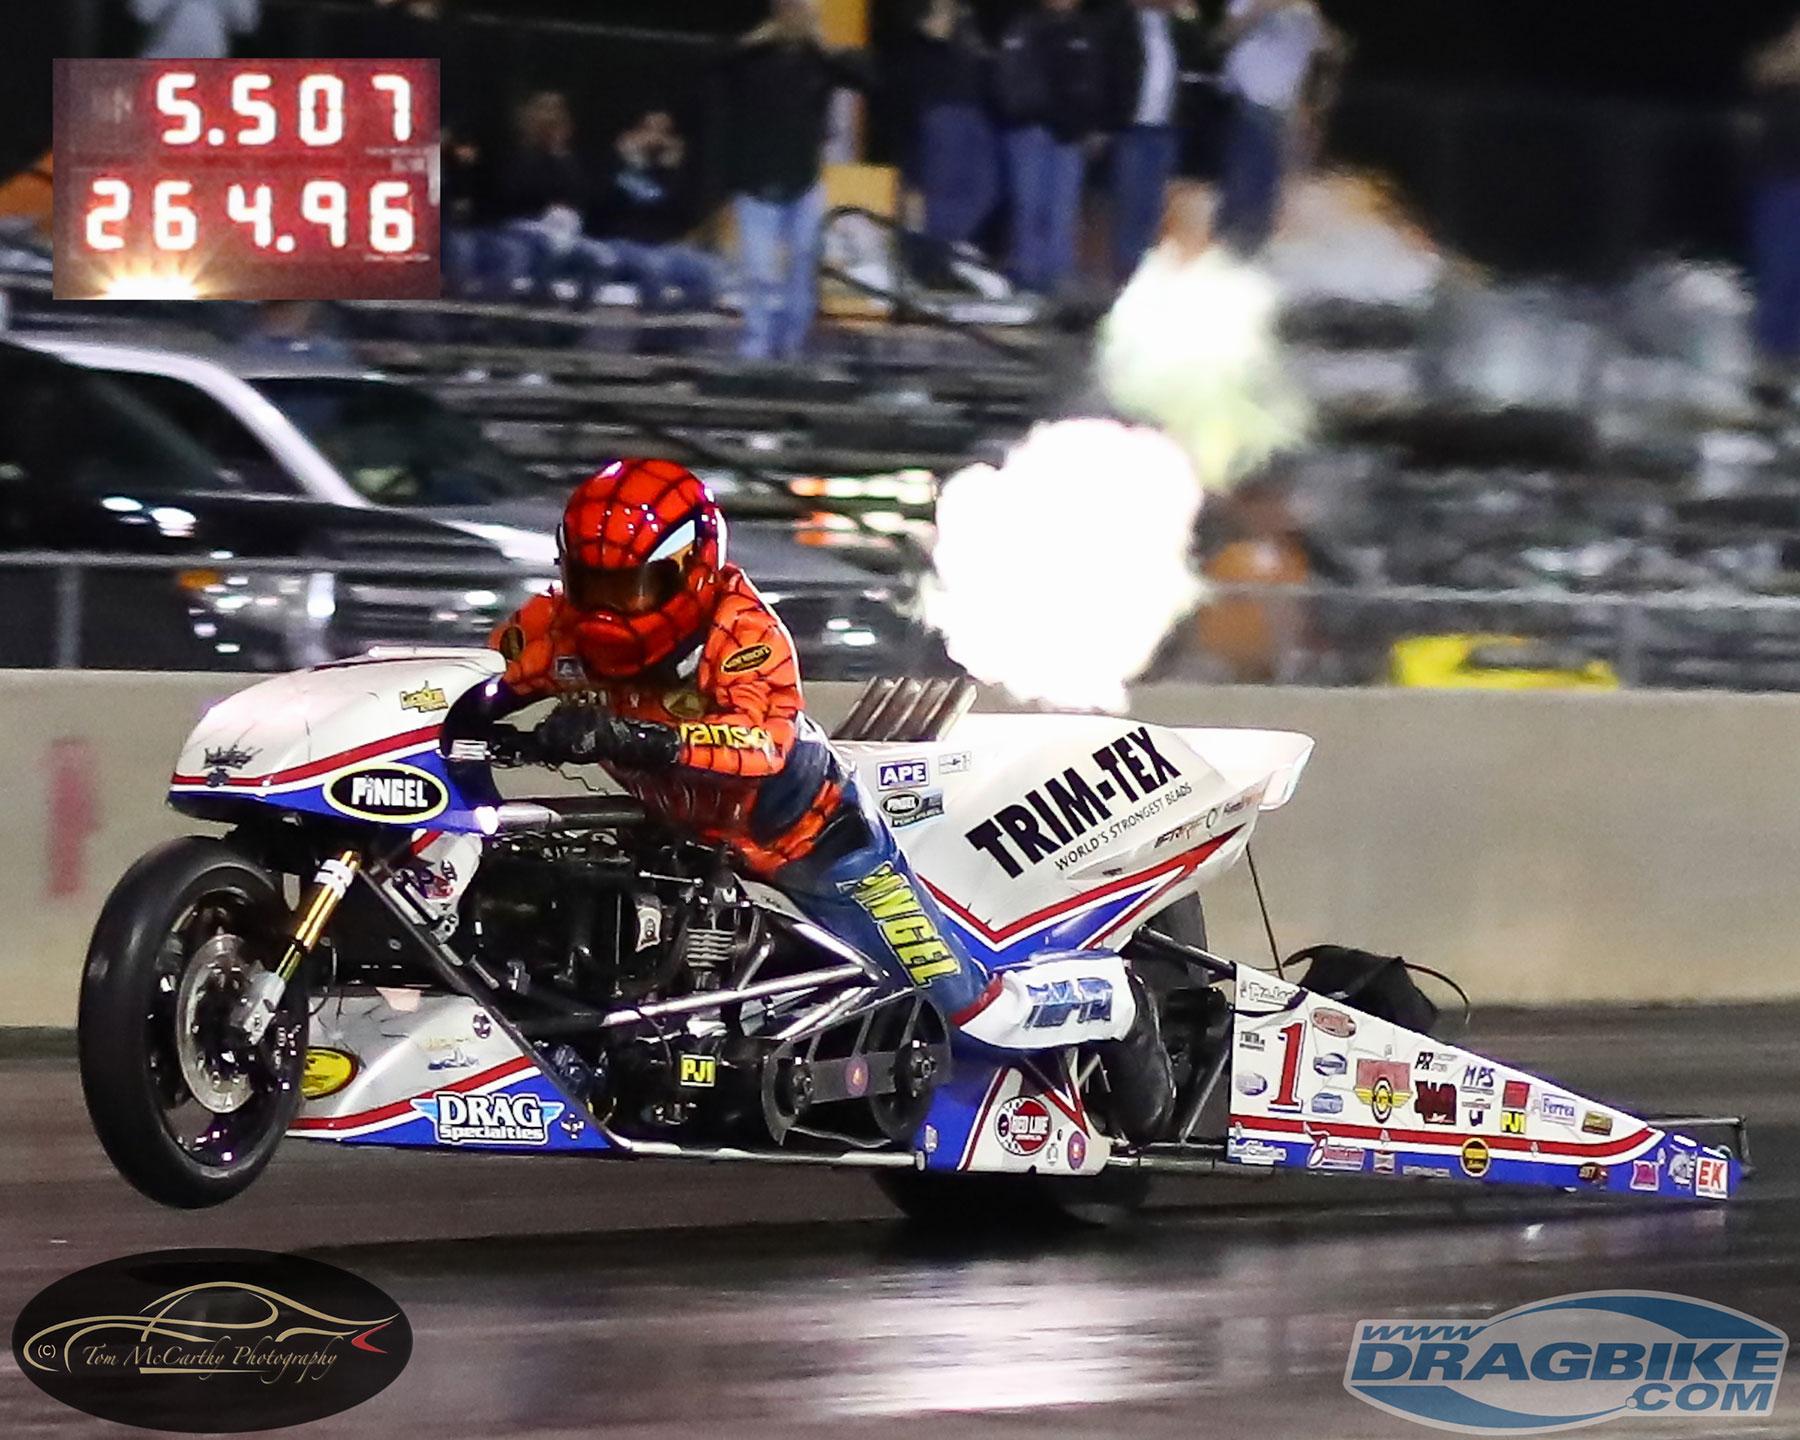 Larry spiderman McBride Top Fuel Motorcycle drag racing